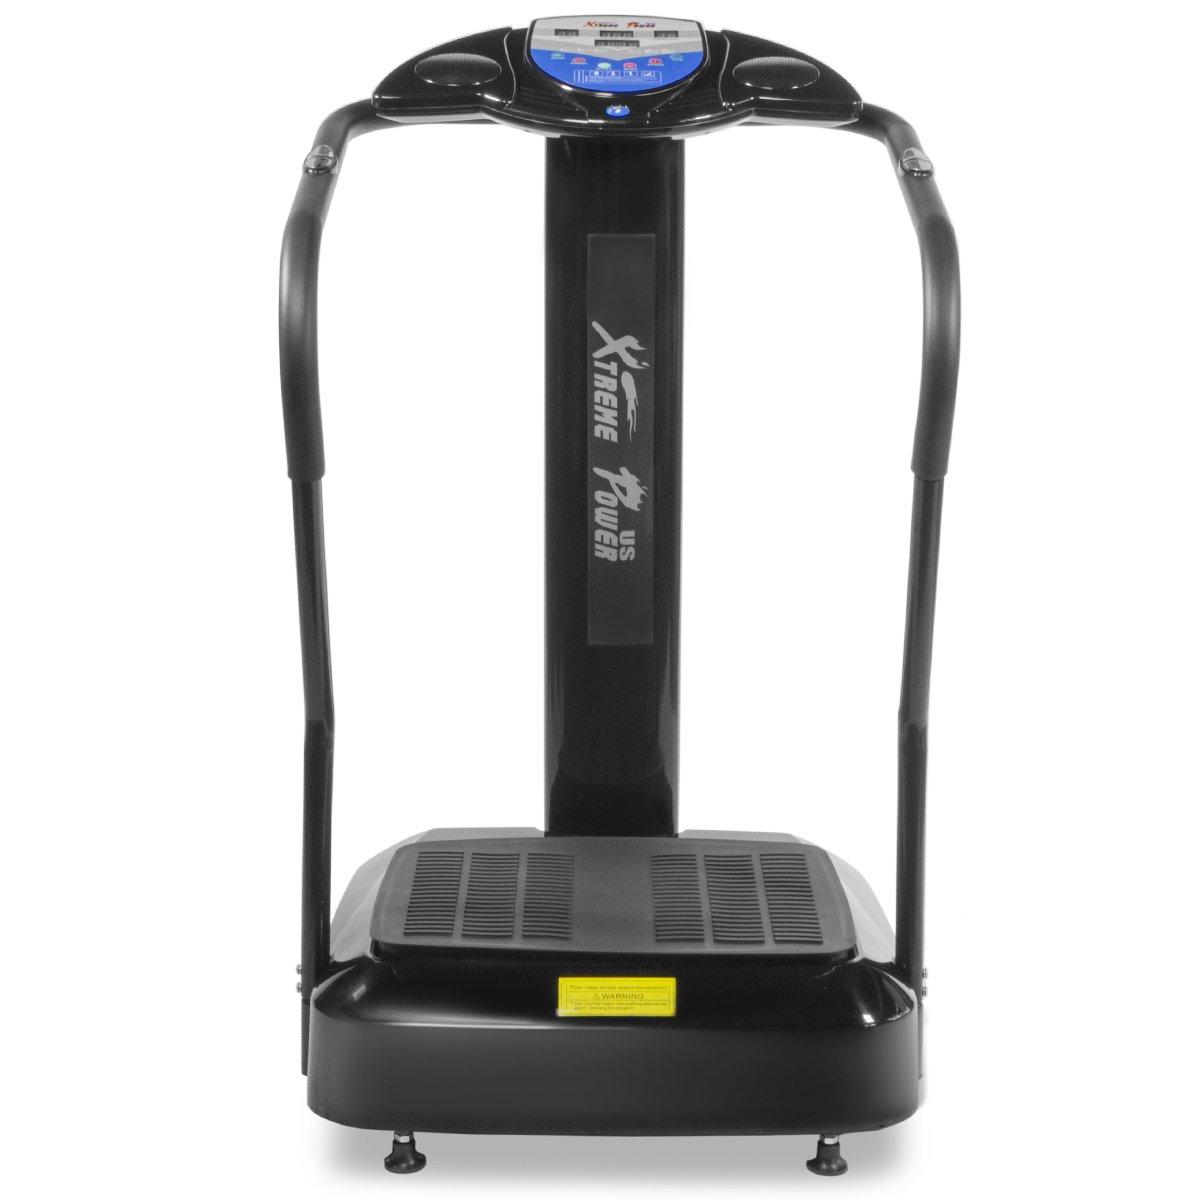 XtremepowerUS 2000W Slim Full Body Vibration Platform Exercise Crazy Fit Machine (Black) by XtremepowerUS